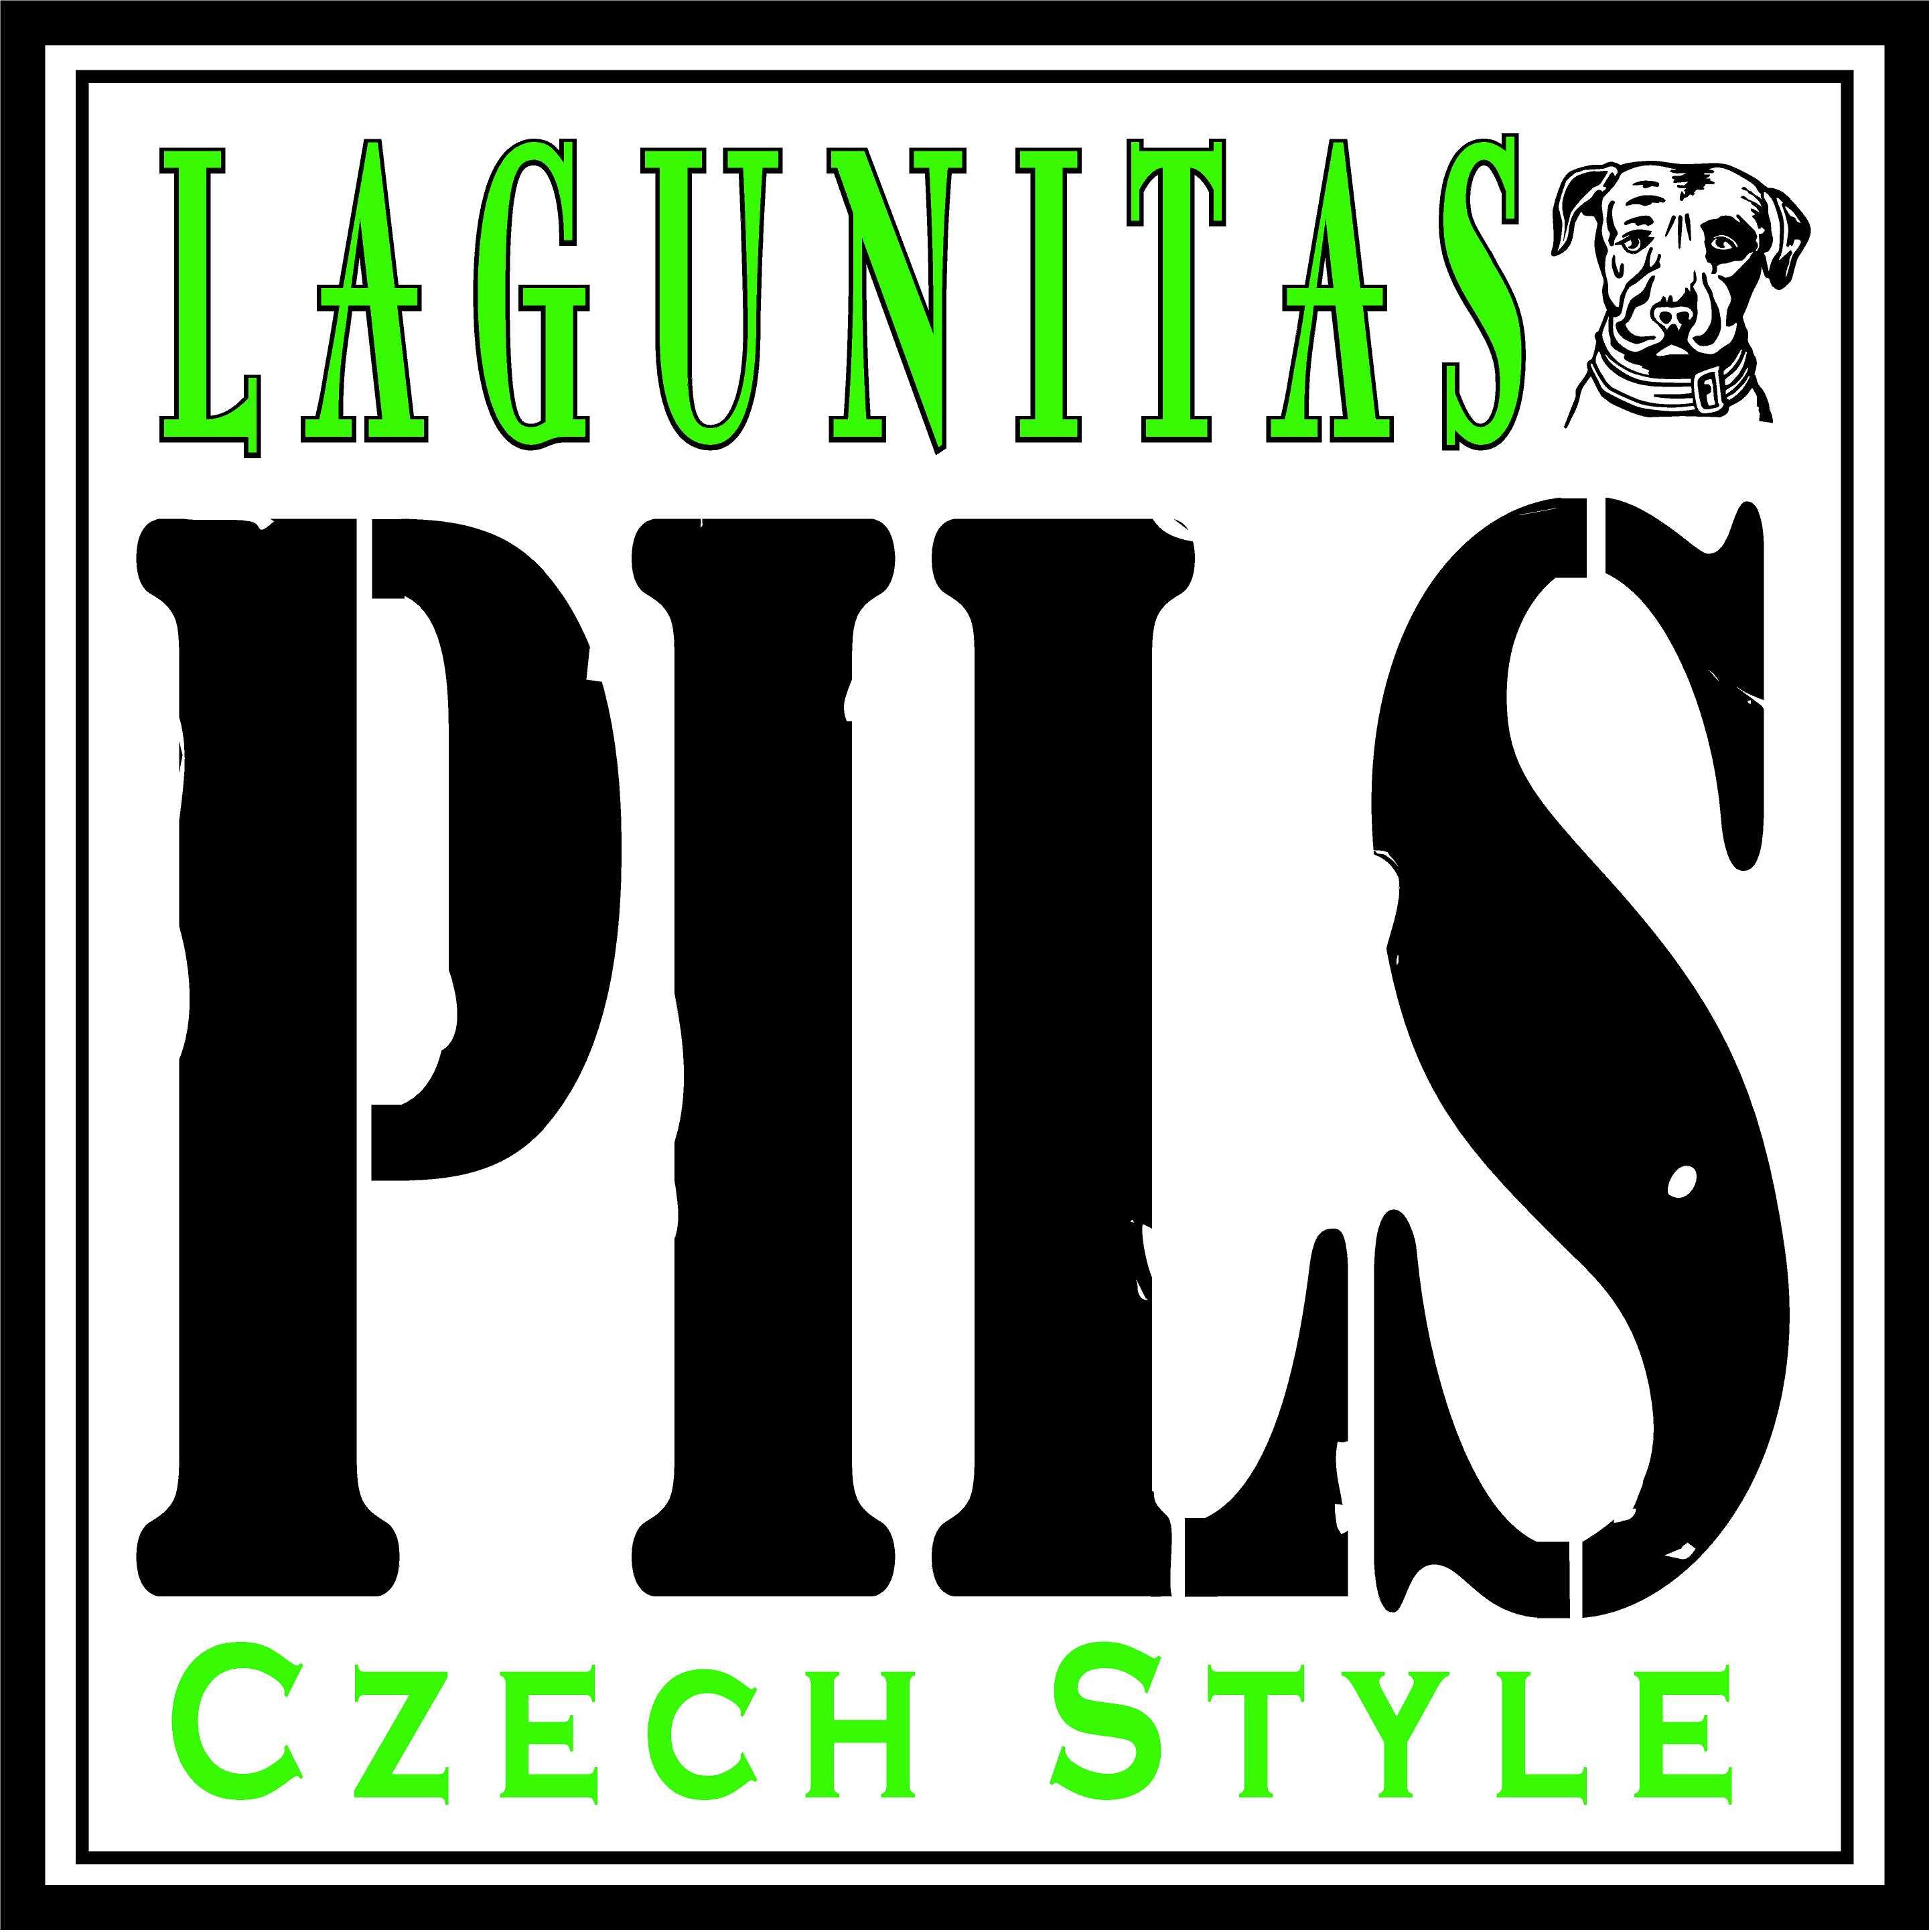 Lagunitas Pils Czech Style